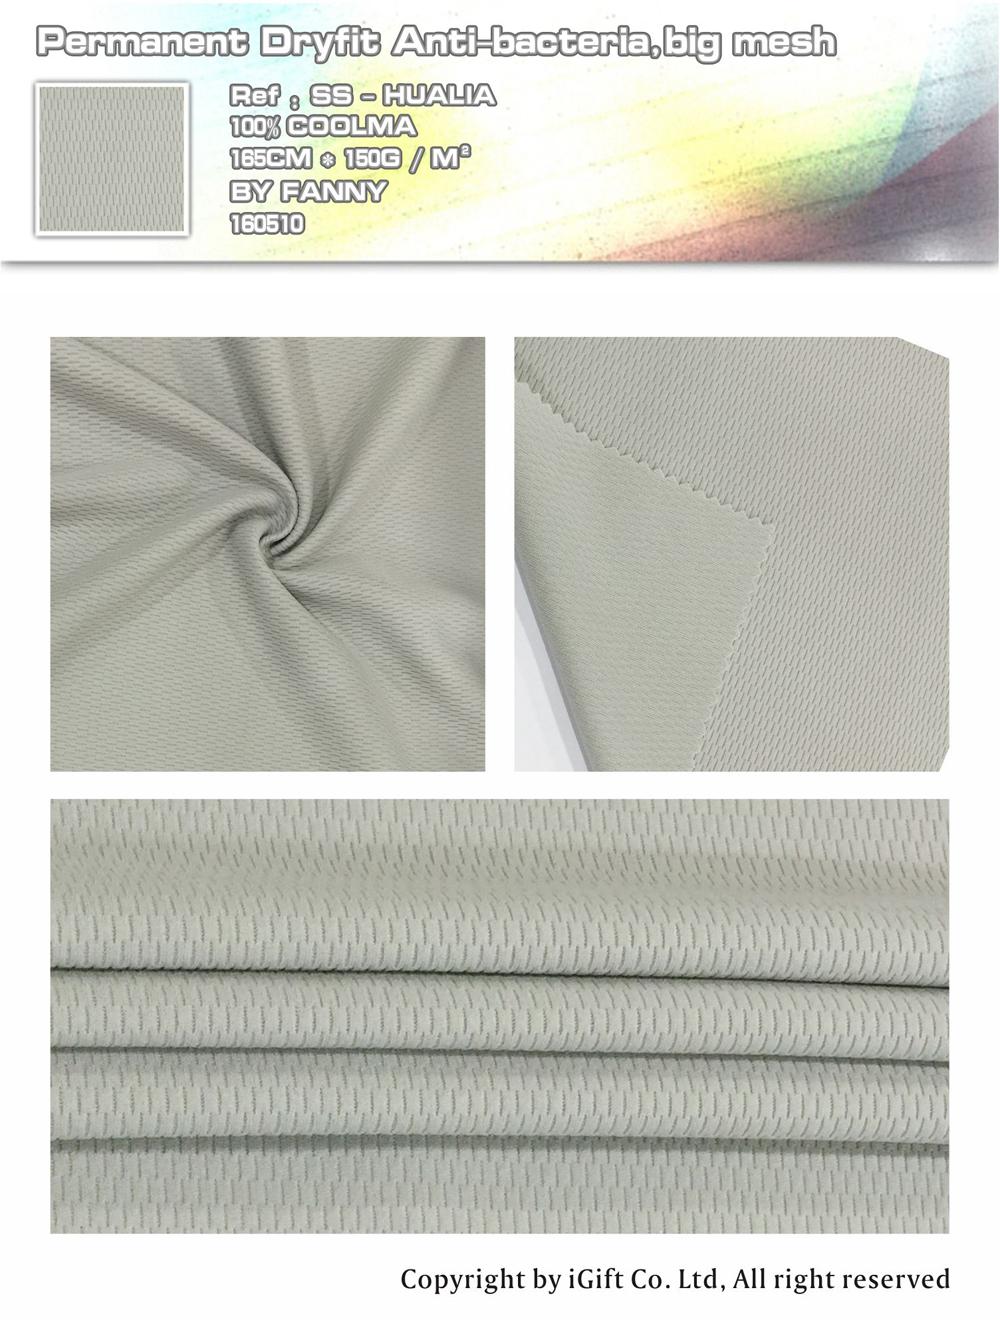 Permanent Dryfit Anti-bacteria,big mesh   Ref:SS-HUALIA    100% COOLMA   165CM*150G/M²   BY  FANNY   160510